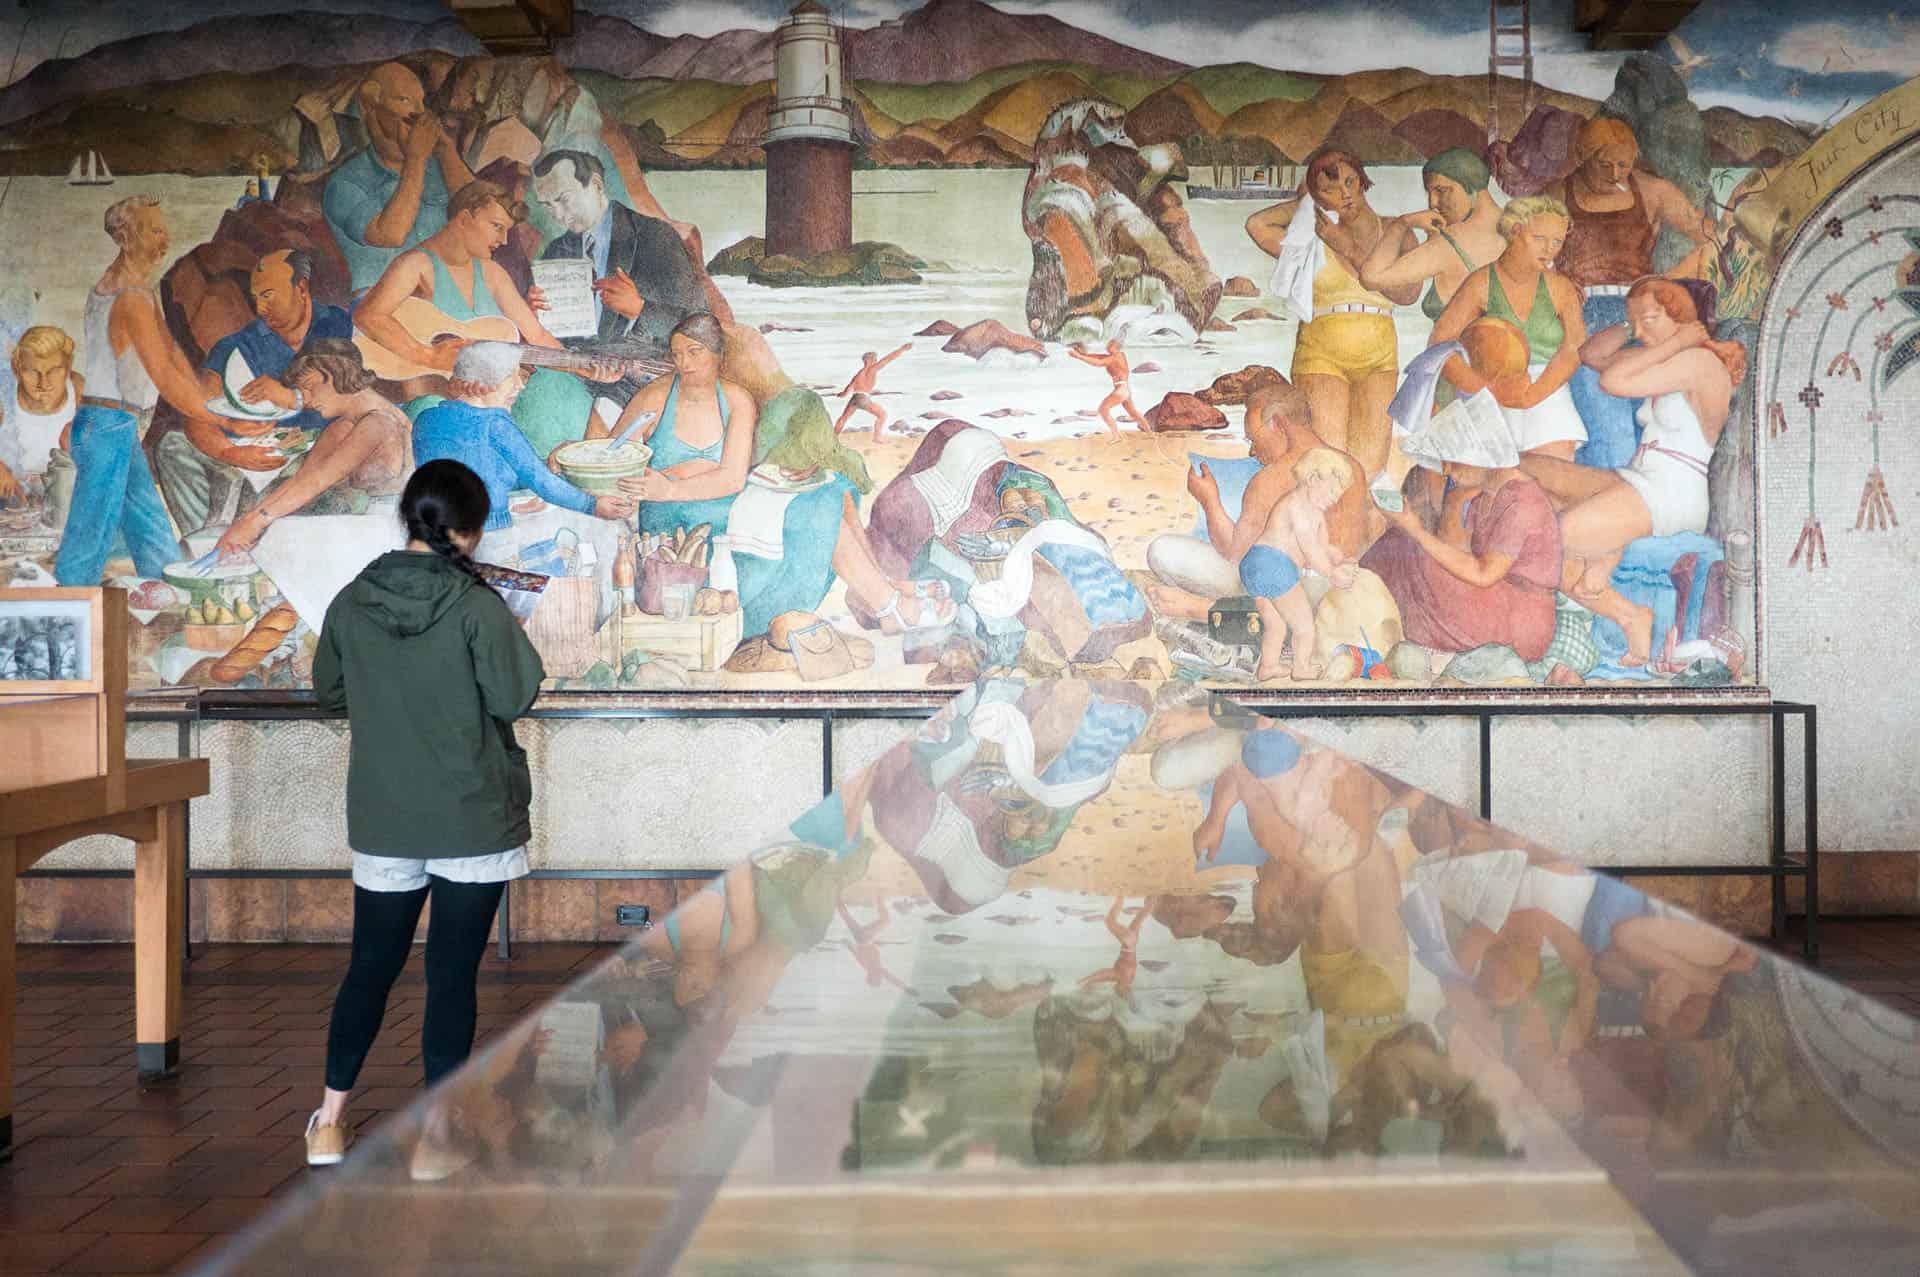 WPA frescos at the Beach Chalet